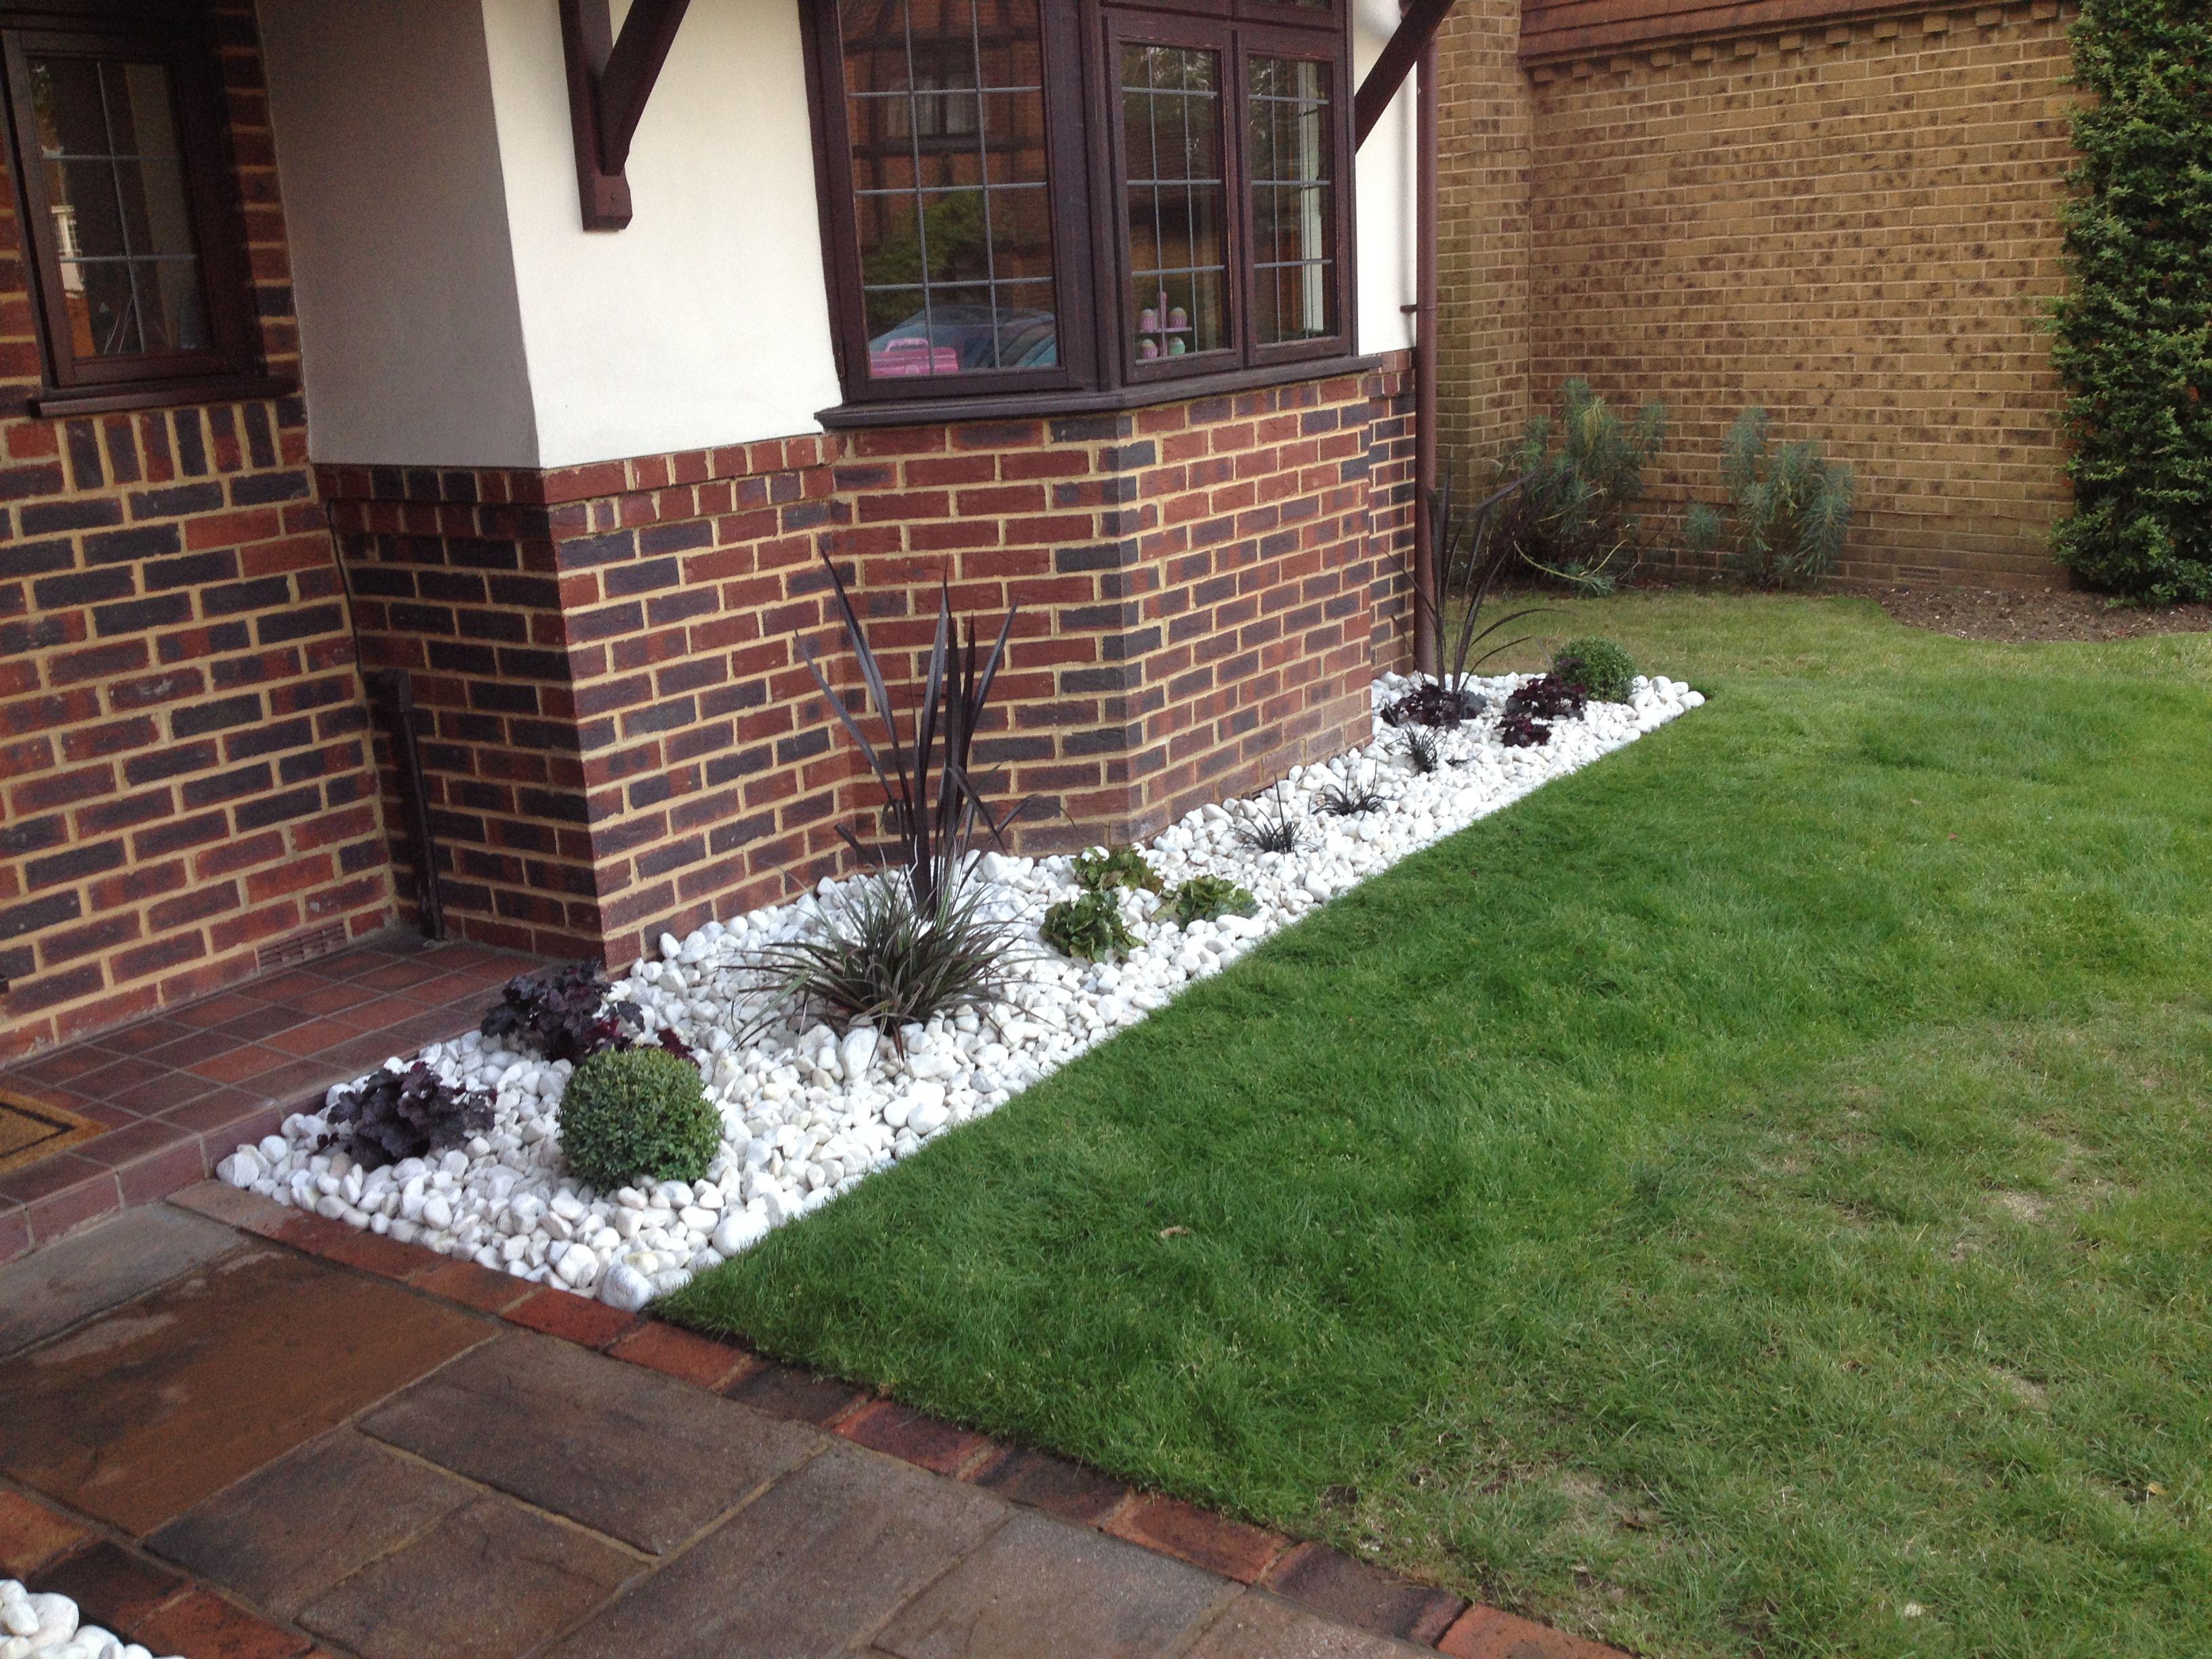 Garden Design Low Maintenance modern, low maintenance border design for front garden in